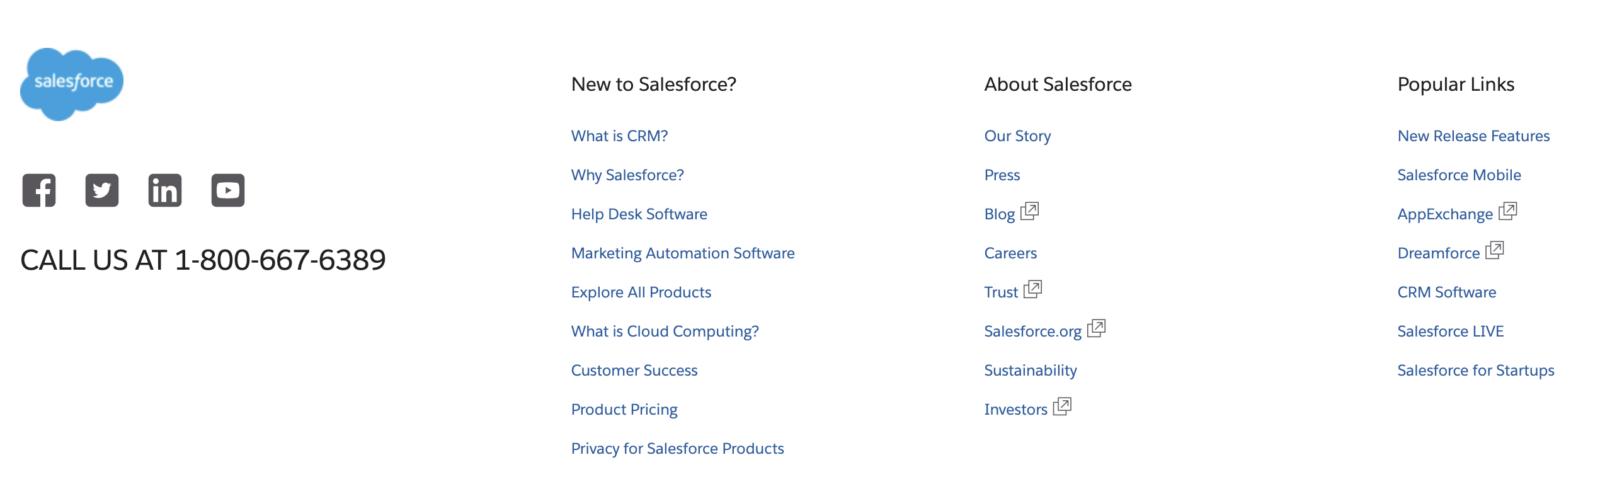 salesforce-menu-of-options